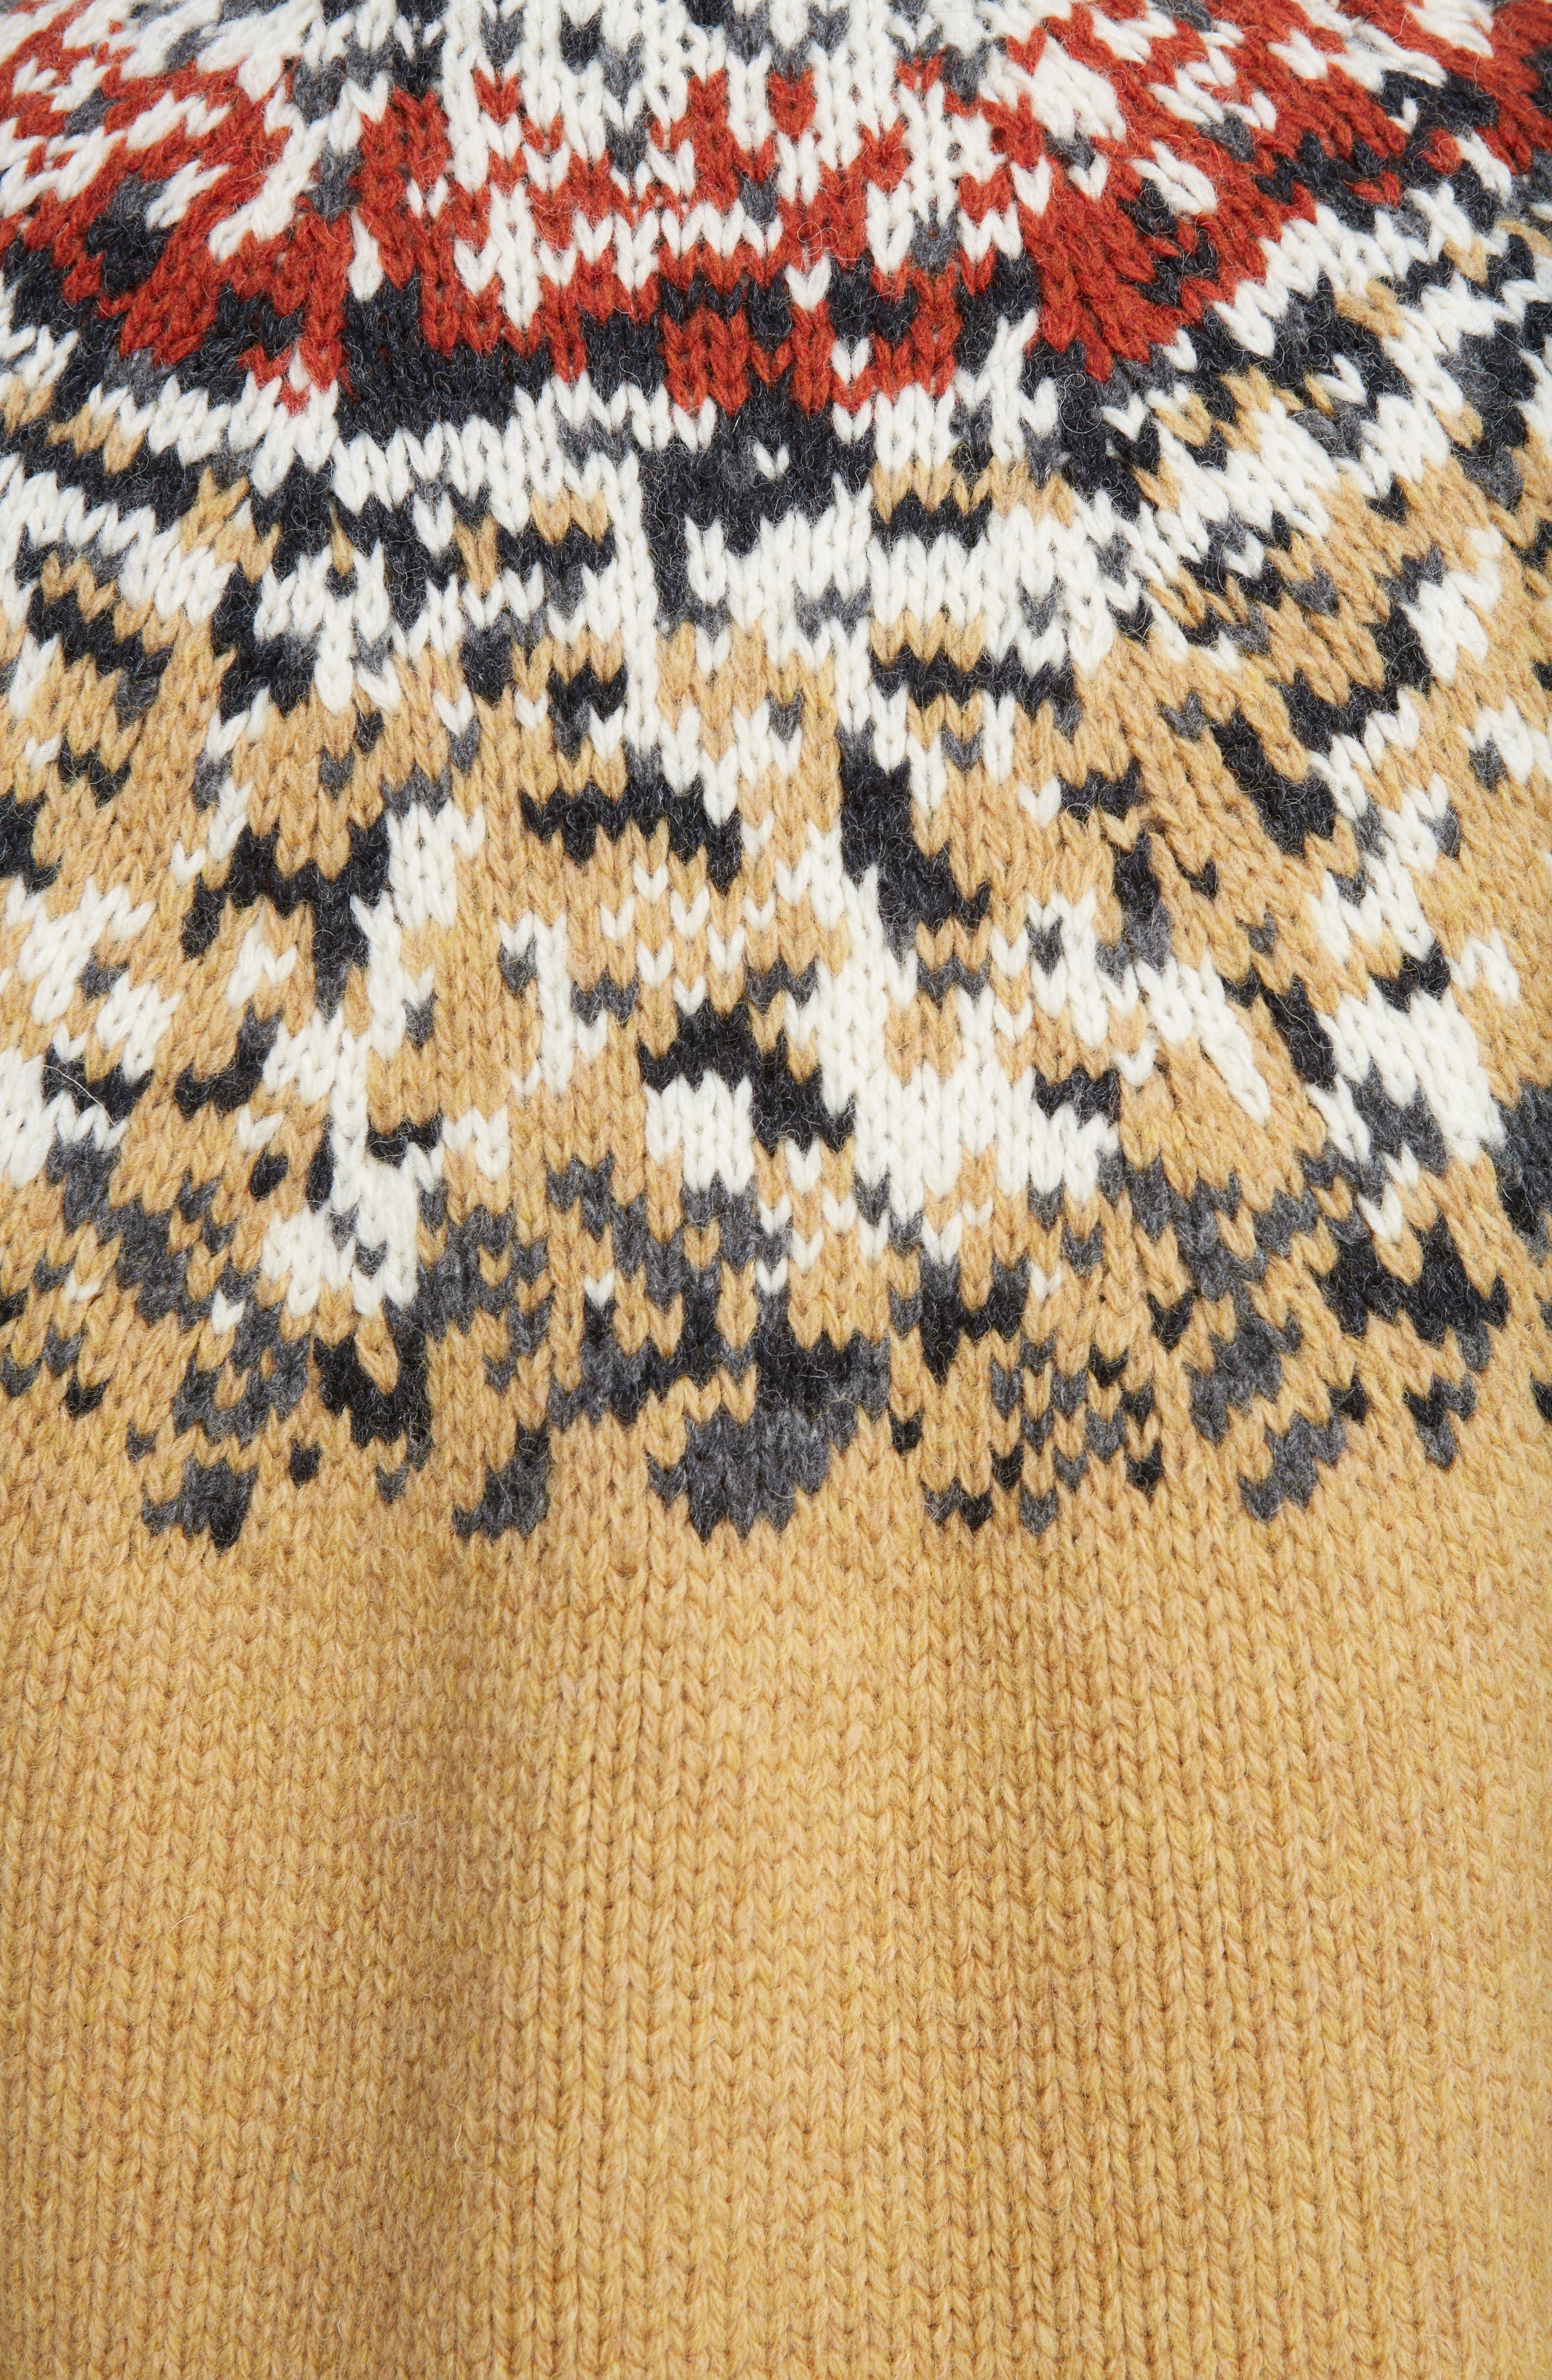 Sirius Heavy Icelandic High Neck Sweater,                             Alternate thumbnail 5, color,                             250